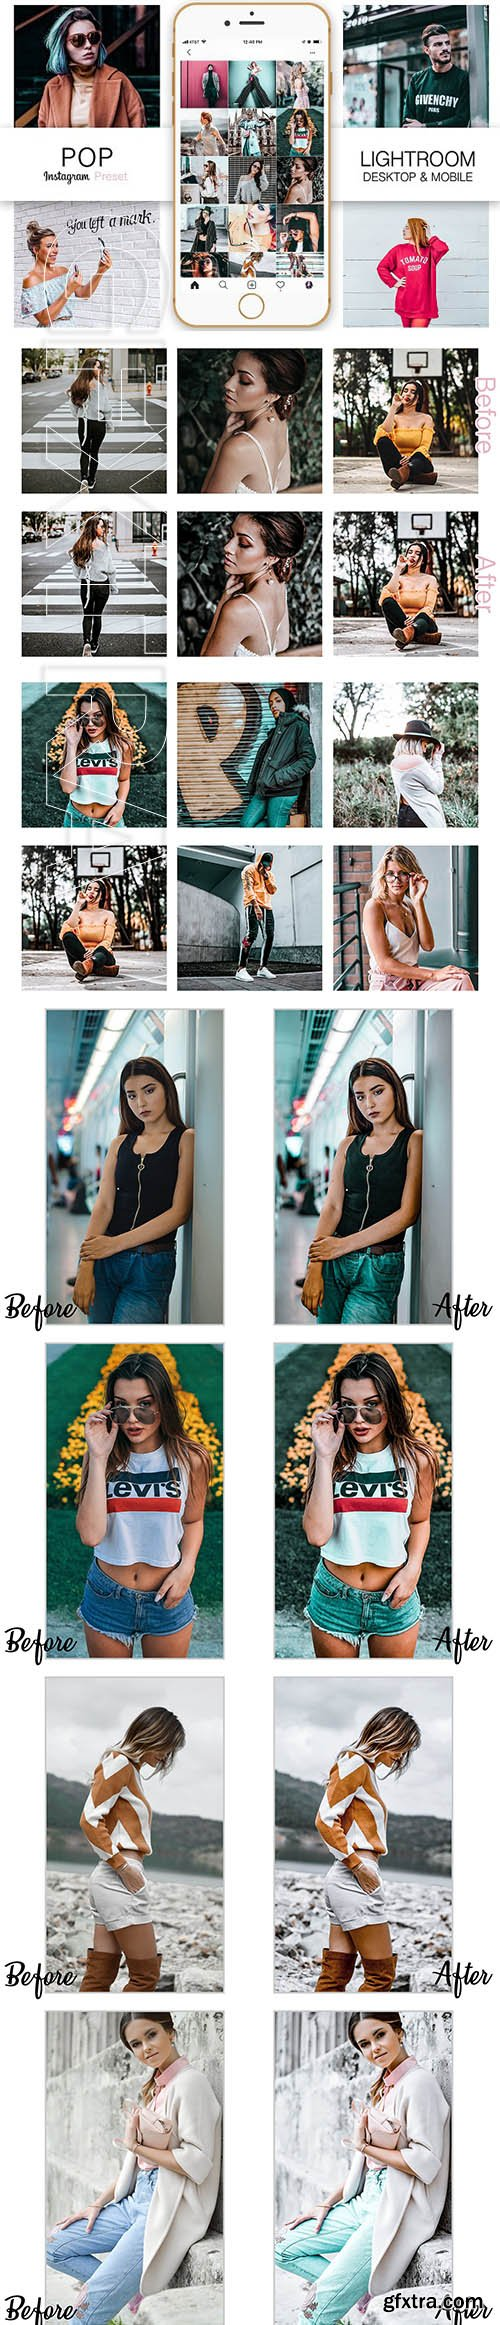 CreativeMarket - Pop Instagram Blogger Presets 3437711